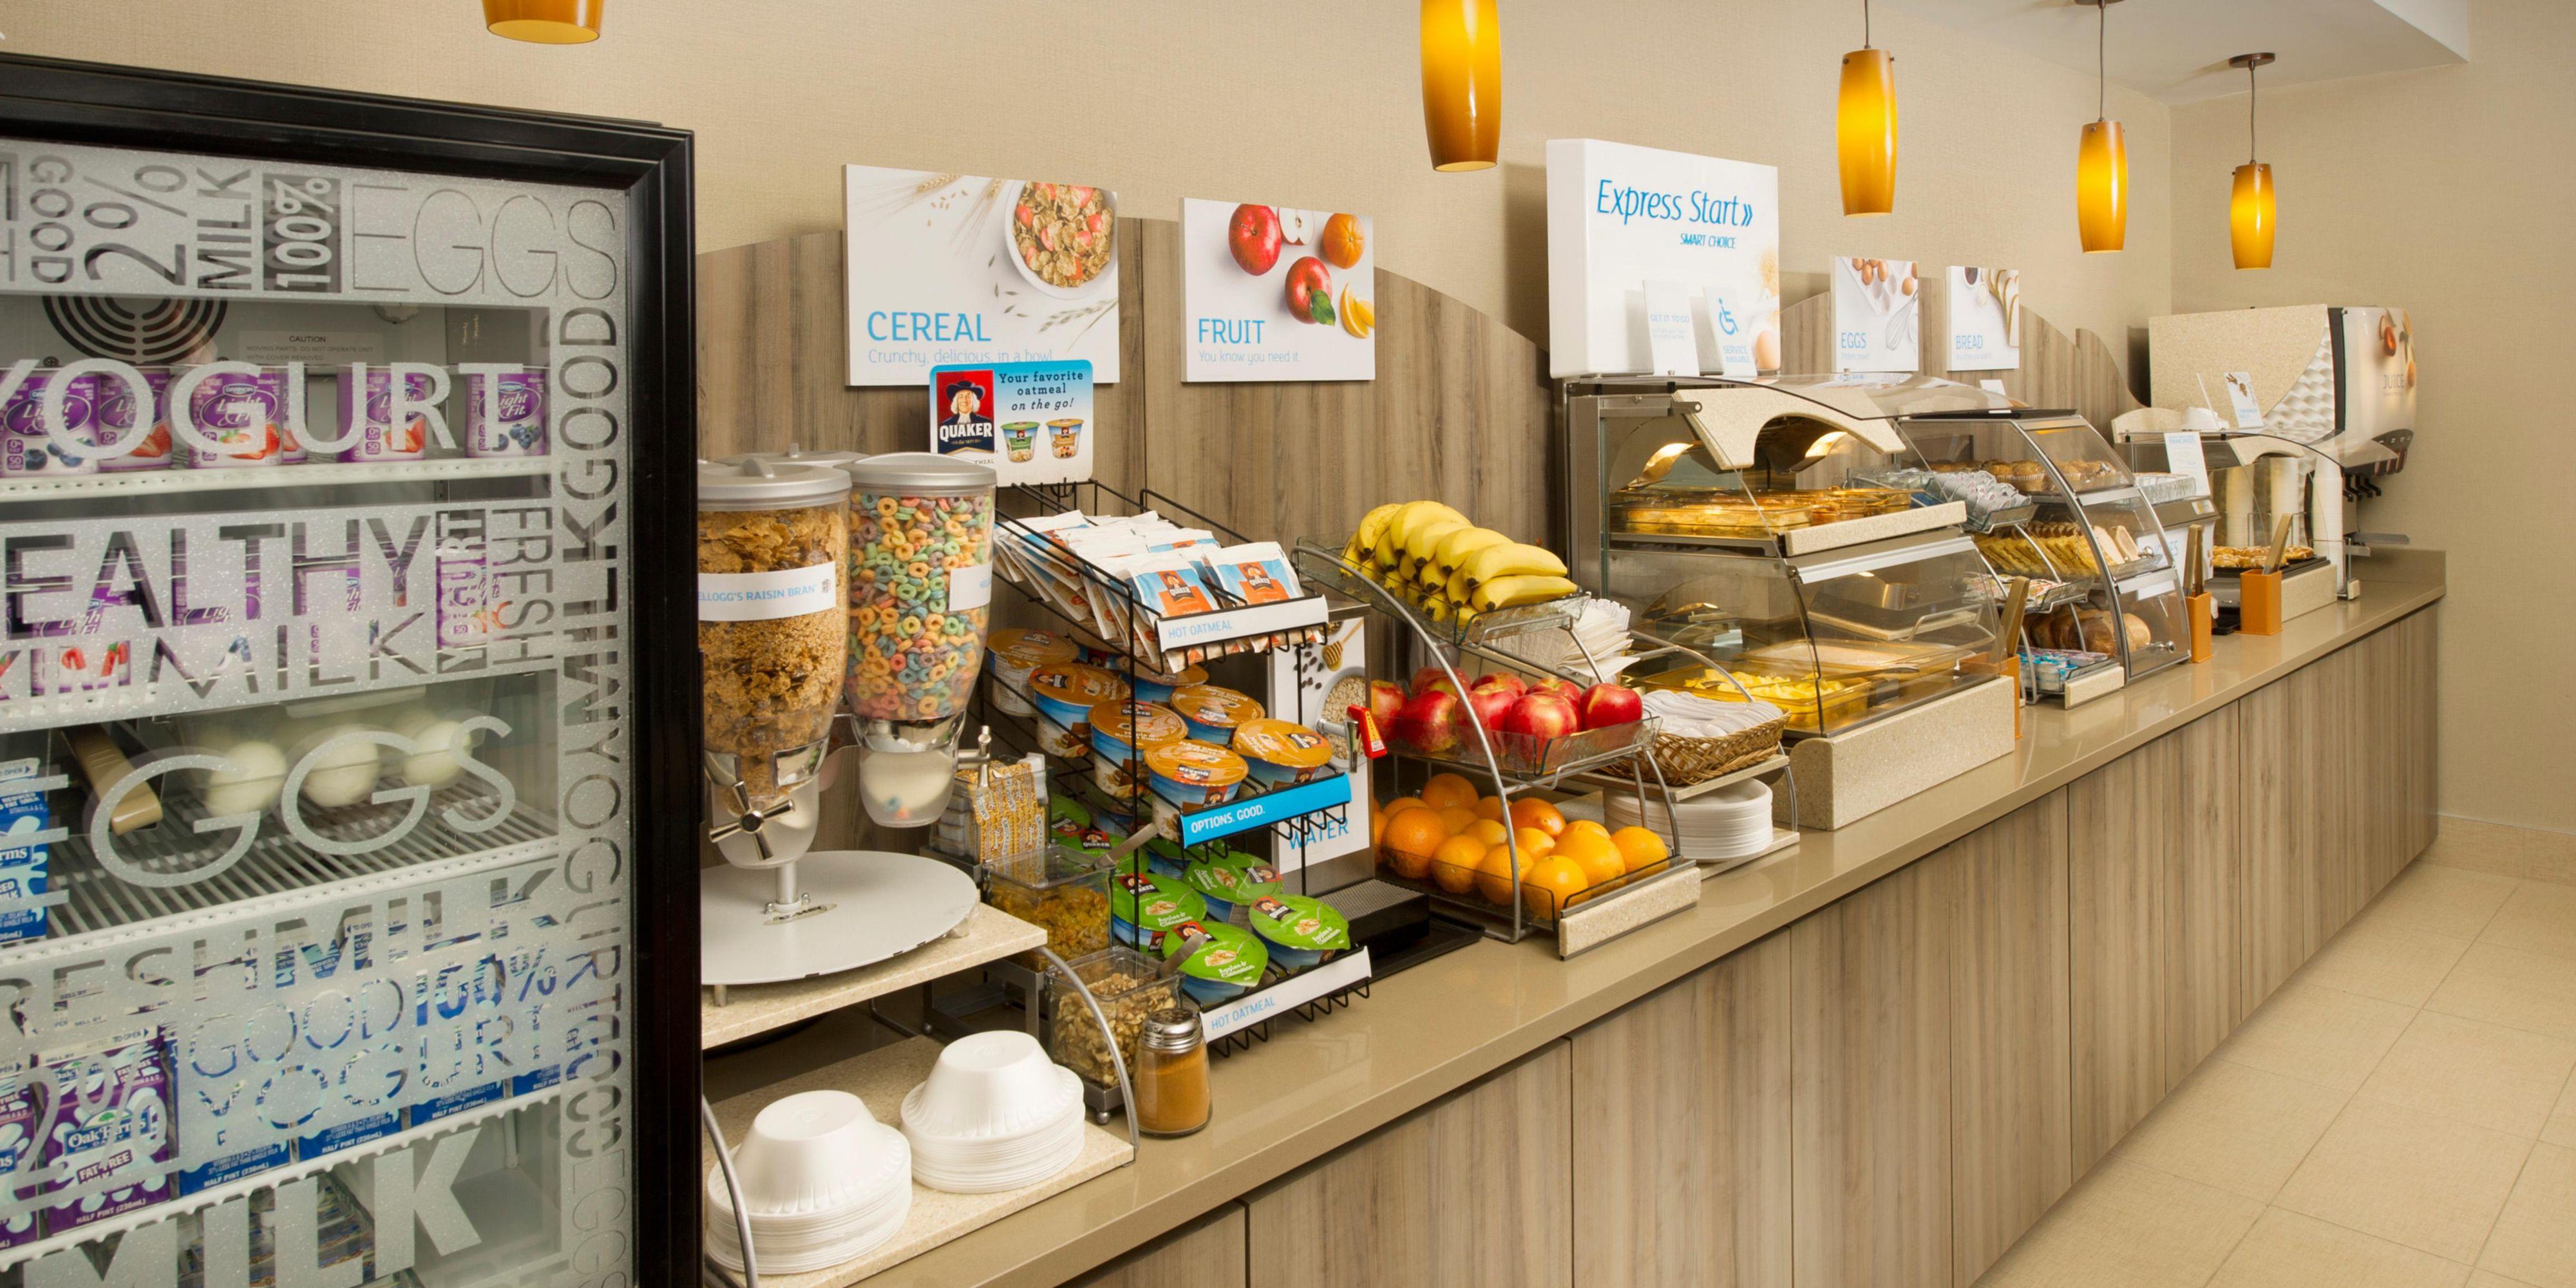 holiday inn express & suites dfw-grapevine hotelihg